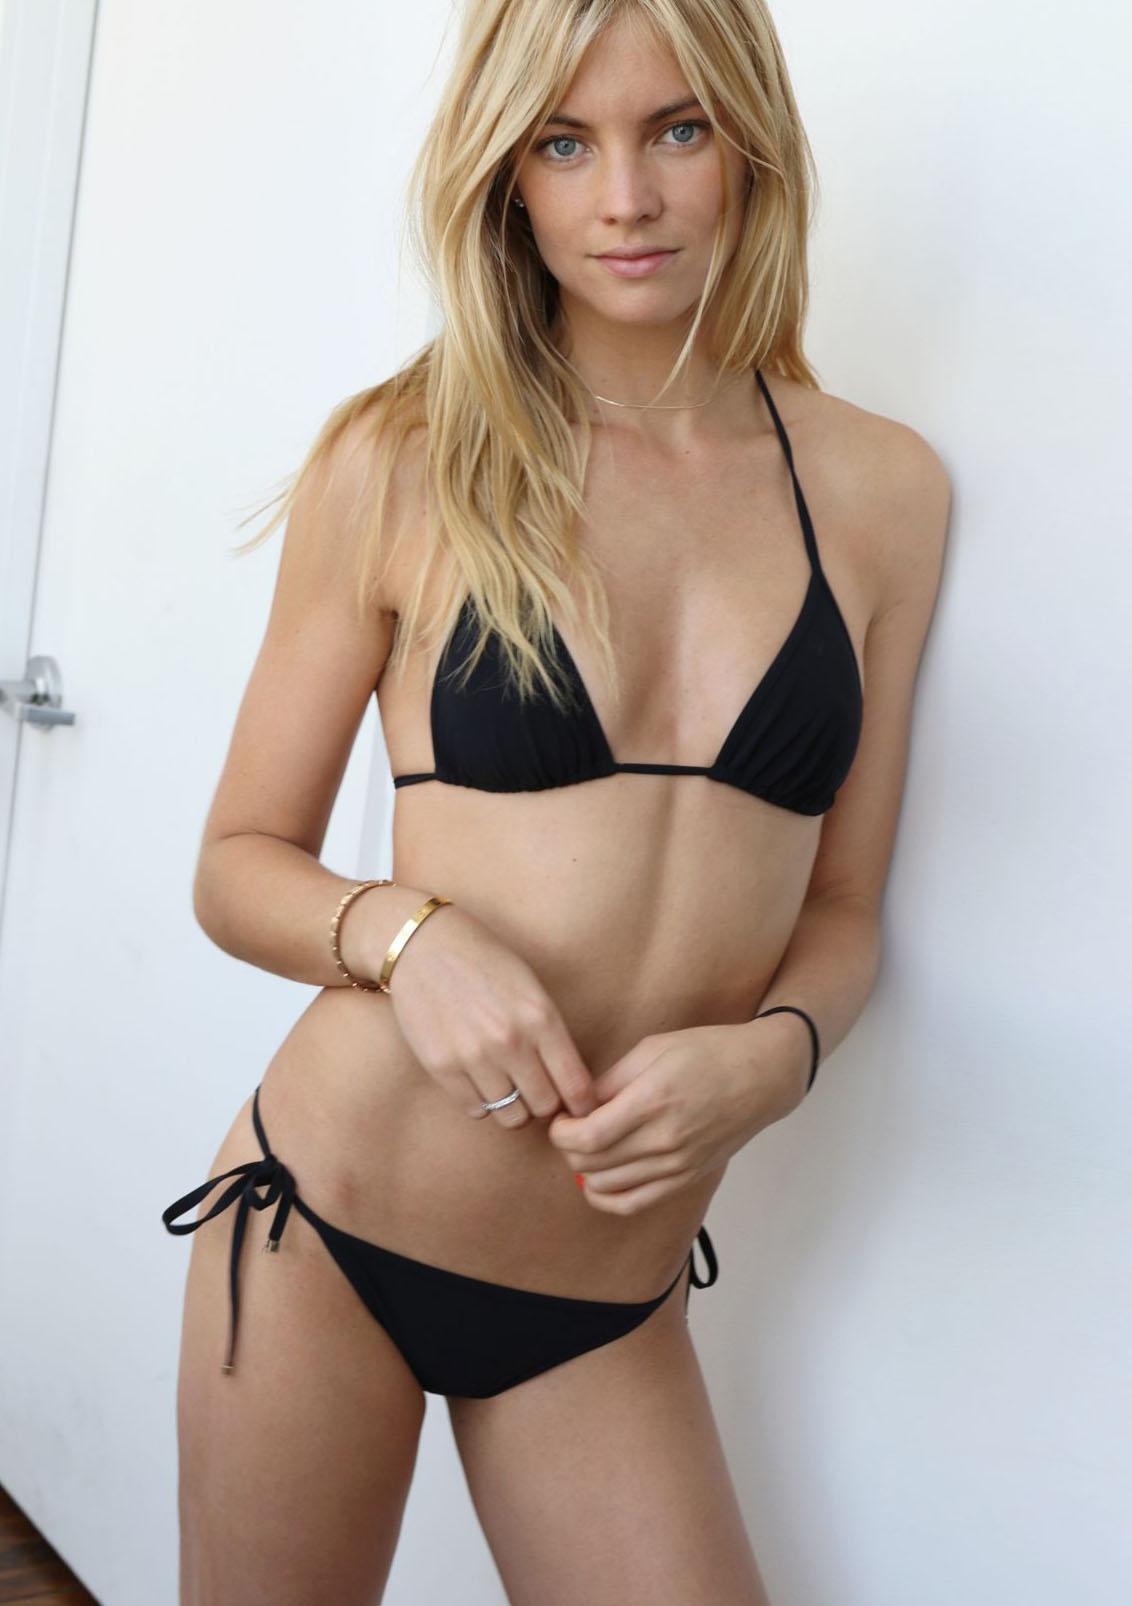 Taylor schilling bikini